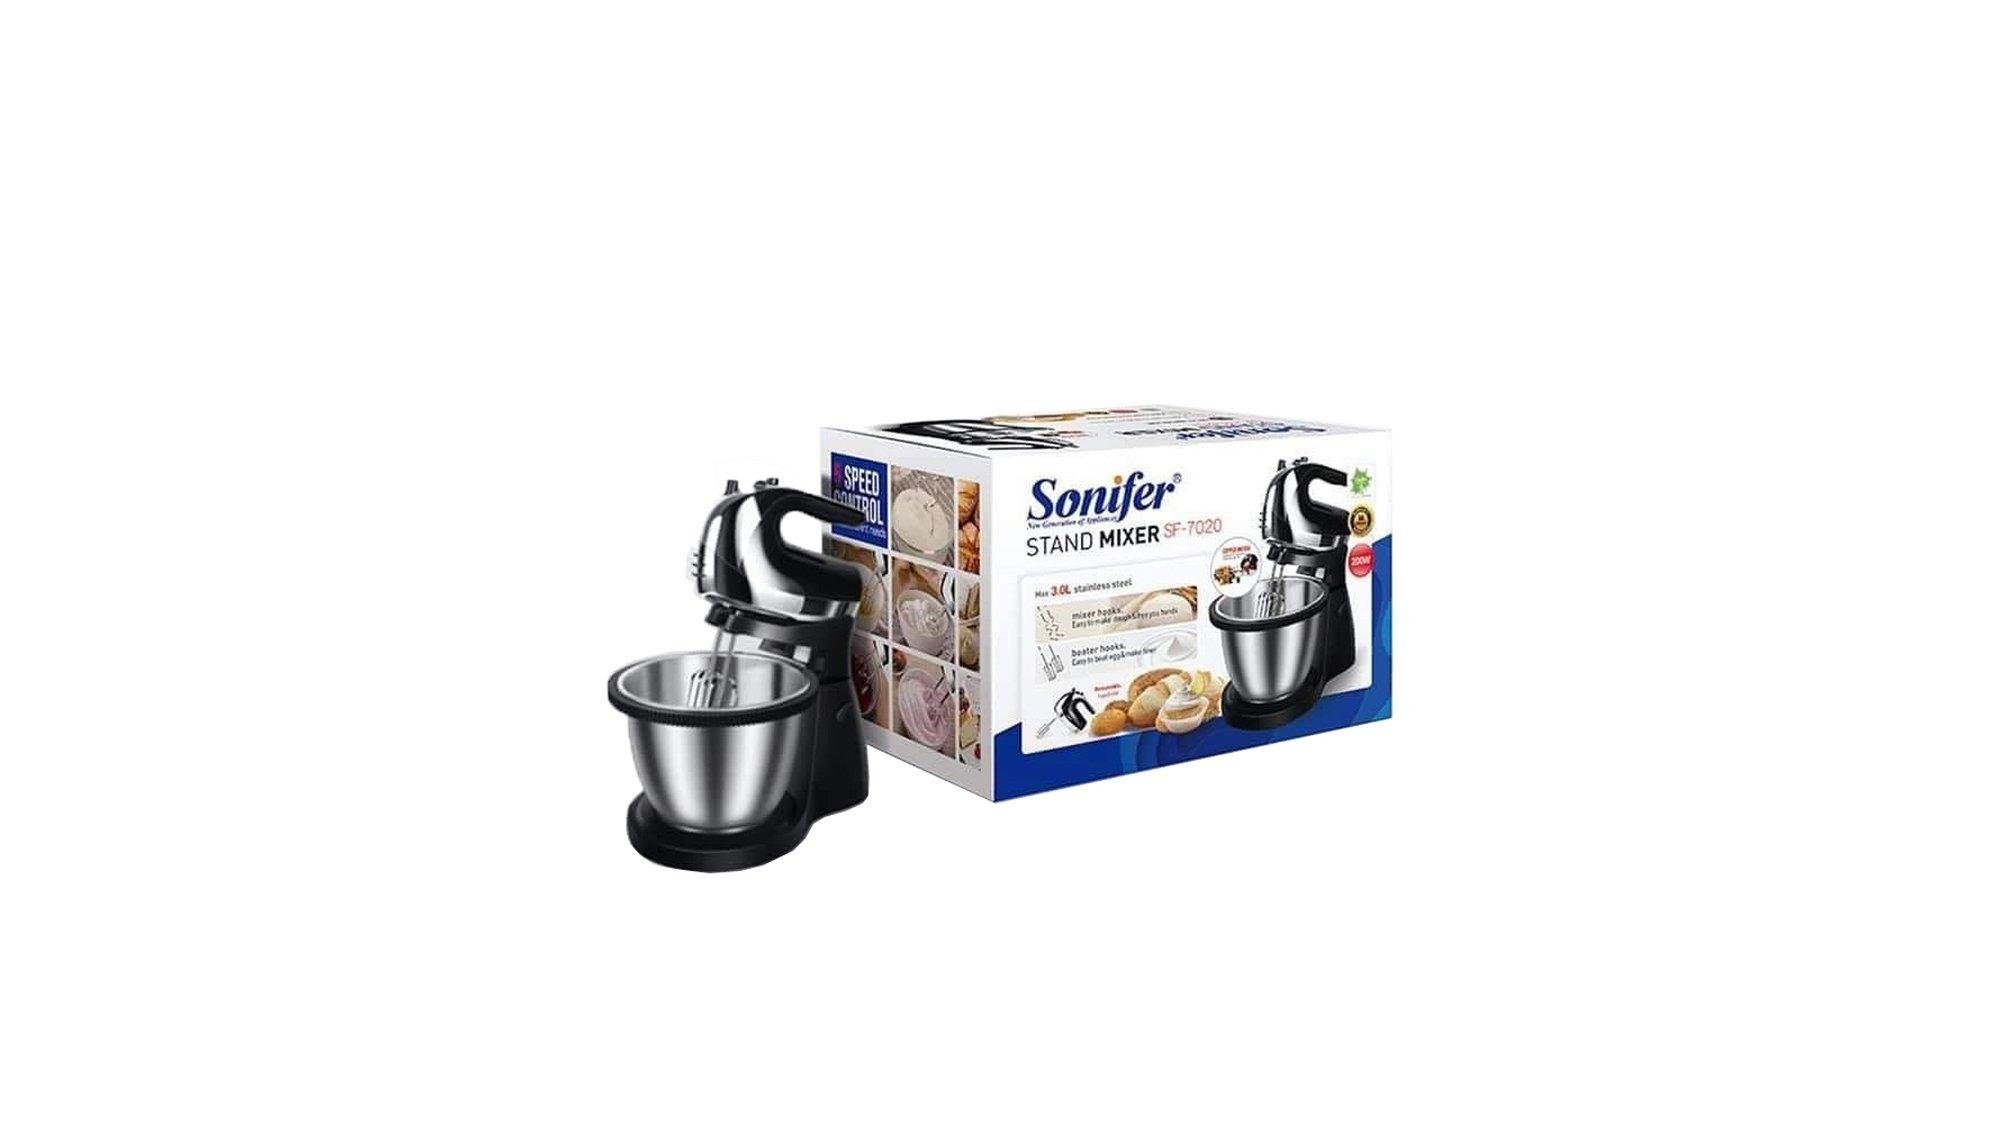 Sonifer Mixer me Korent, 200W, SF-7020